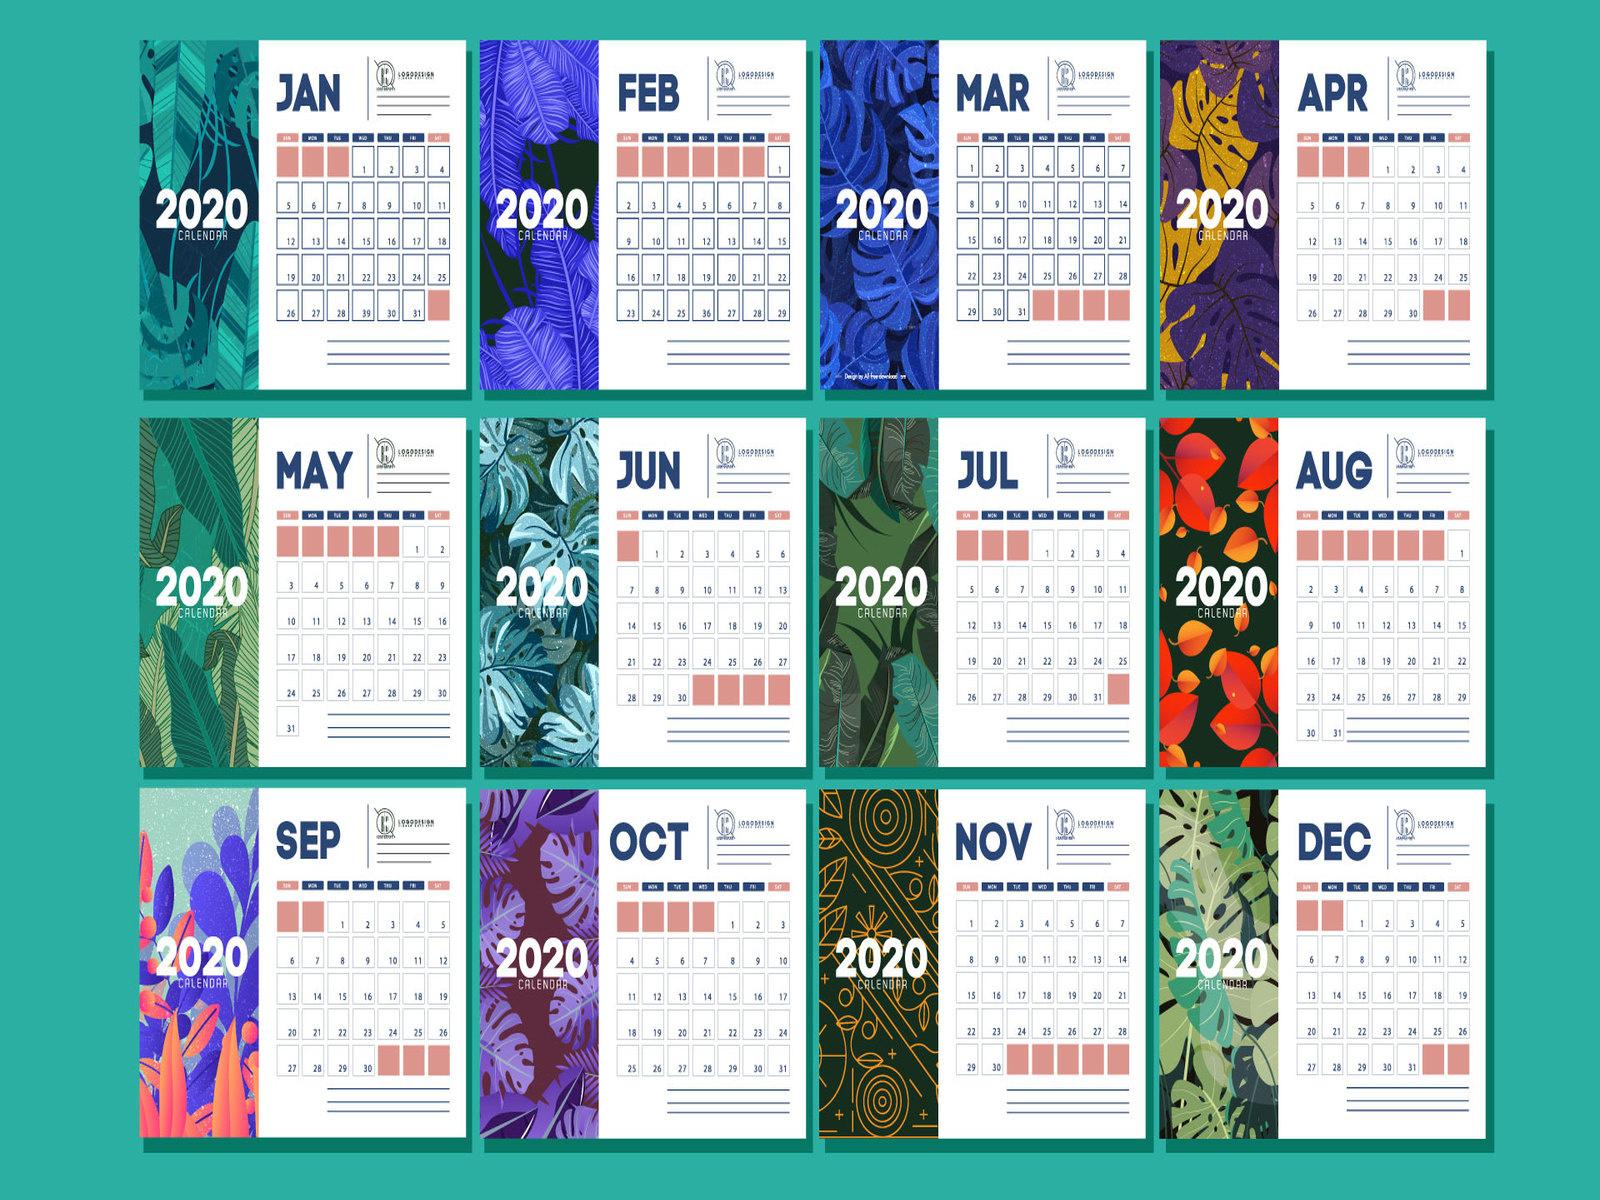 New Year 2020 Calendar Designmd Shopon Hossen On Dribbble